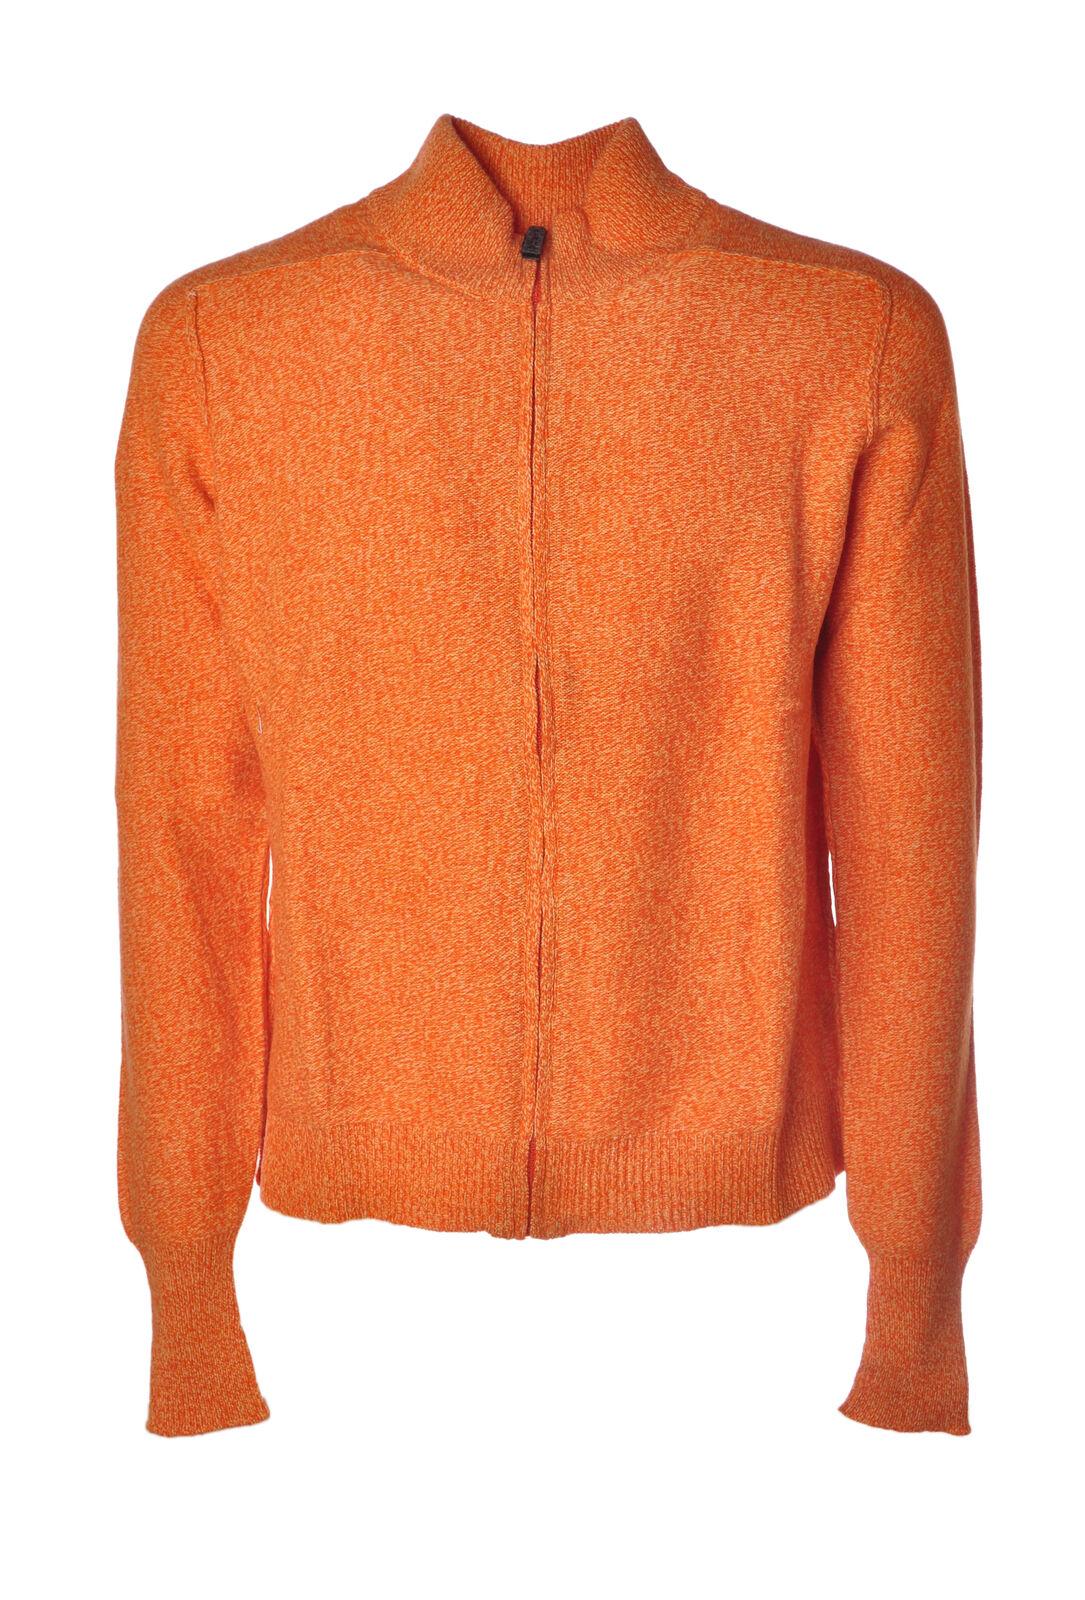 Alpha  -  Sweaters - Male - orange - 4560923A183942